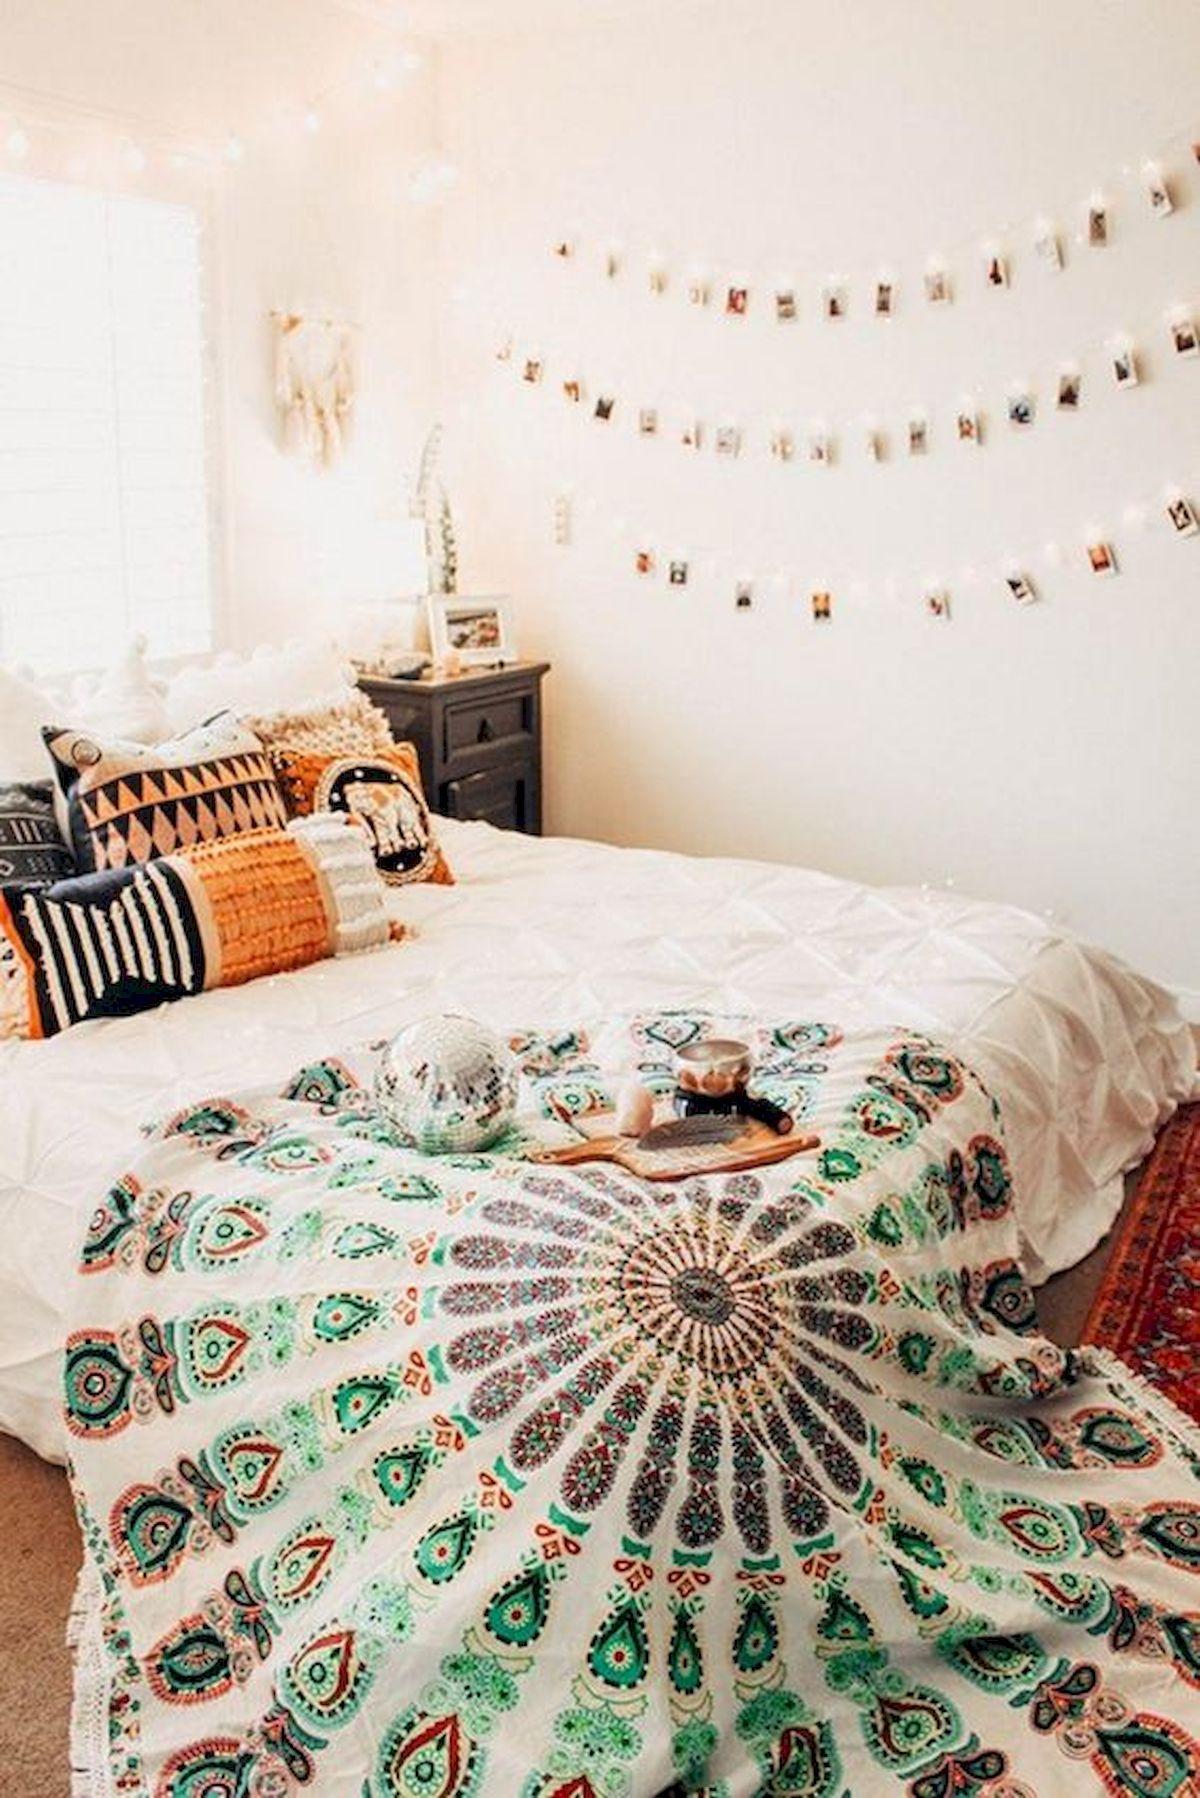 40 Fantastic DIY Decor Ideas For Farmhouse Boho Bedroom Design (16)